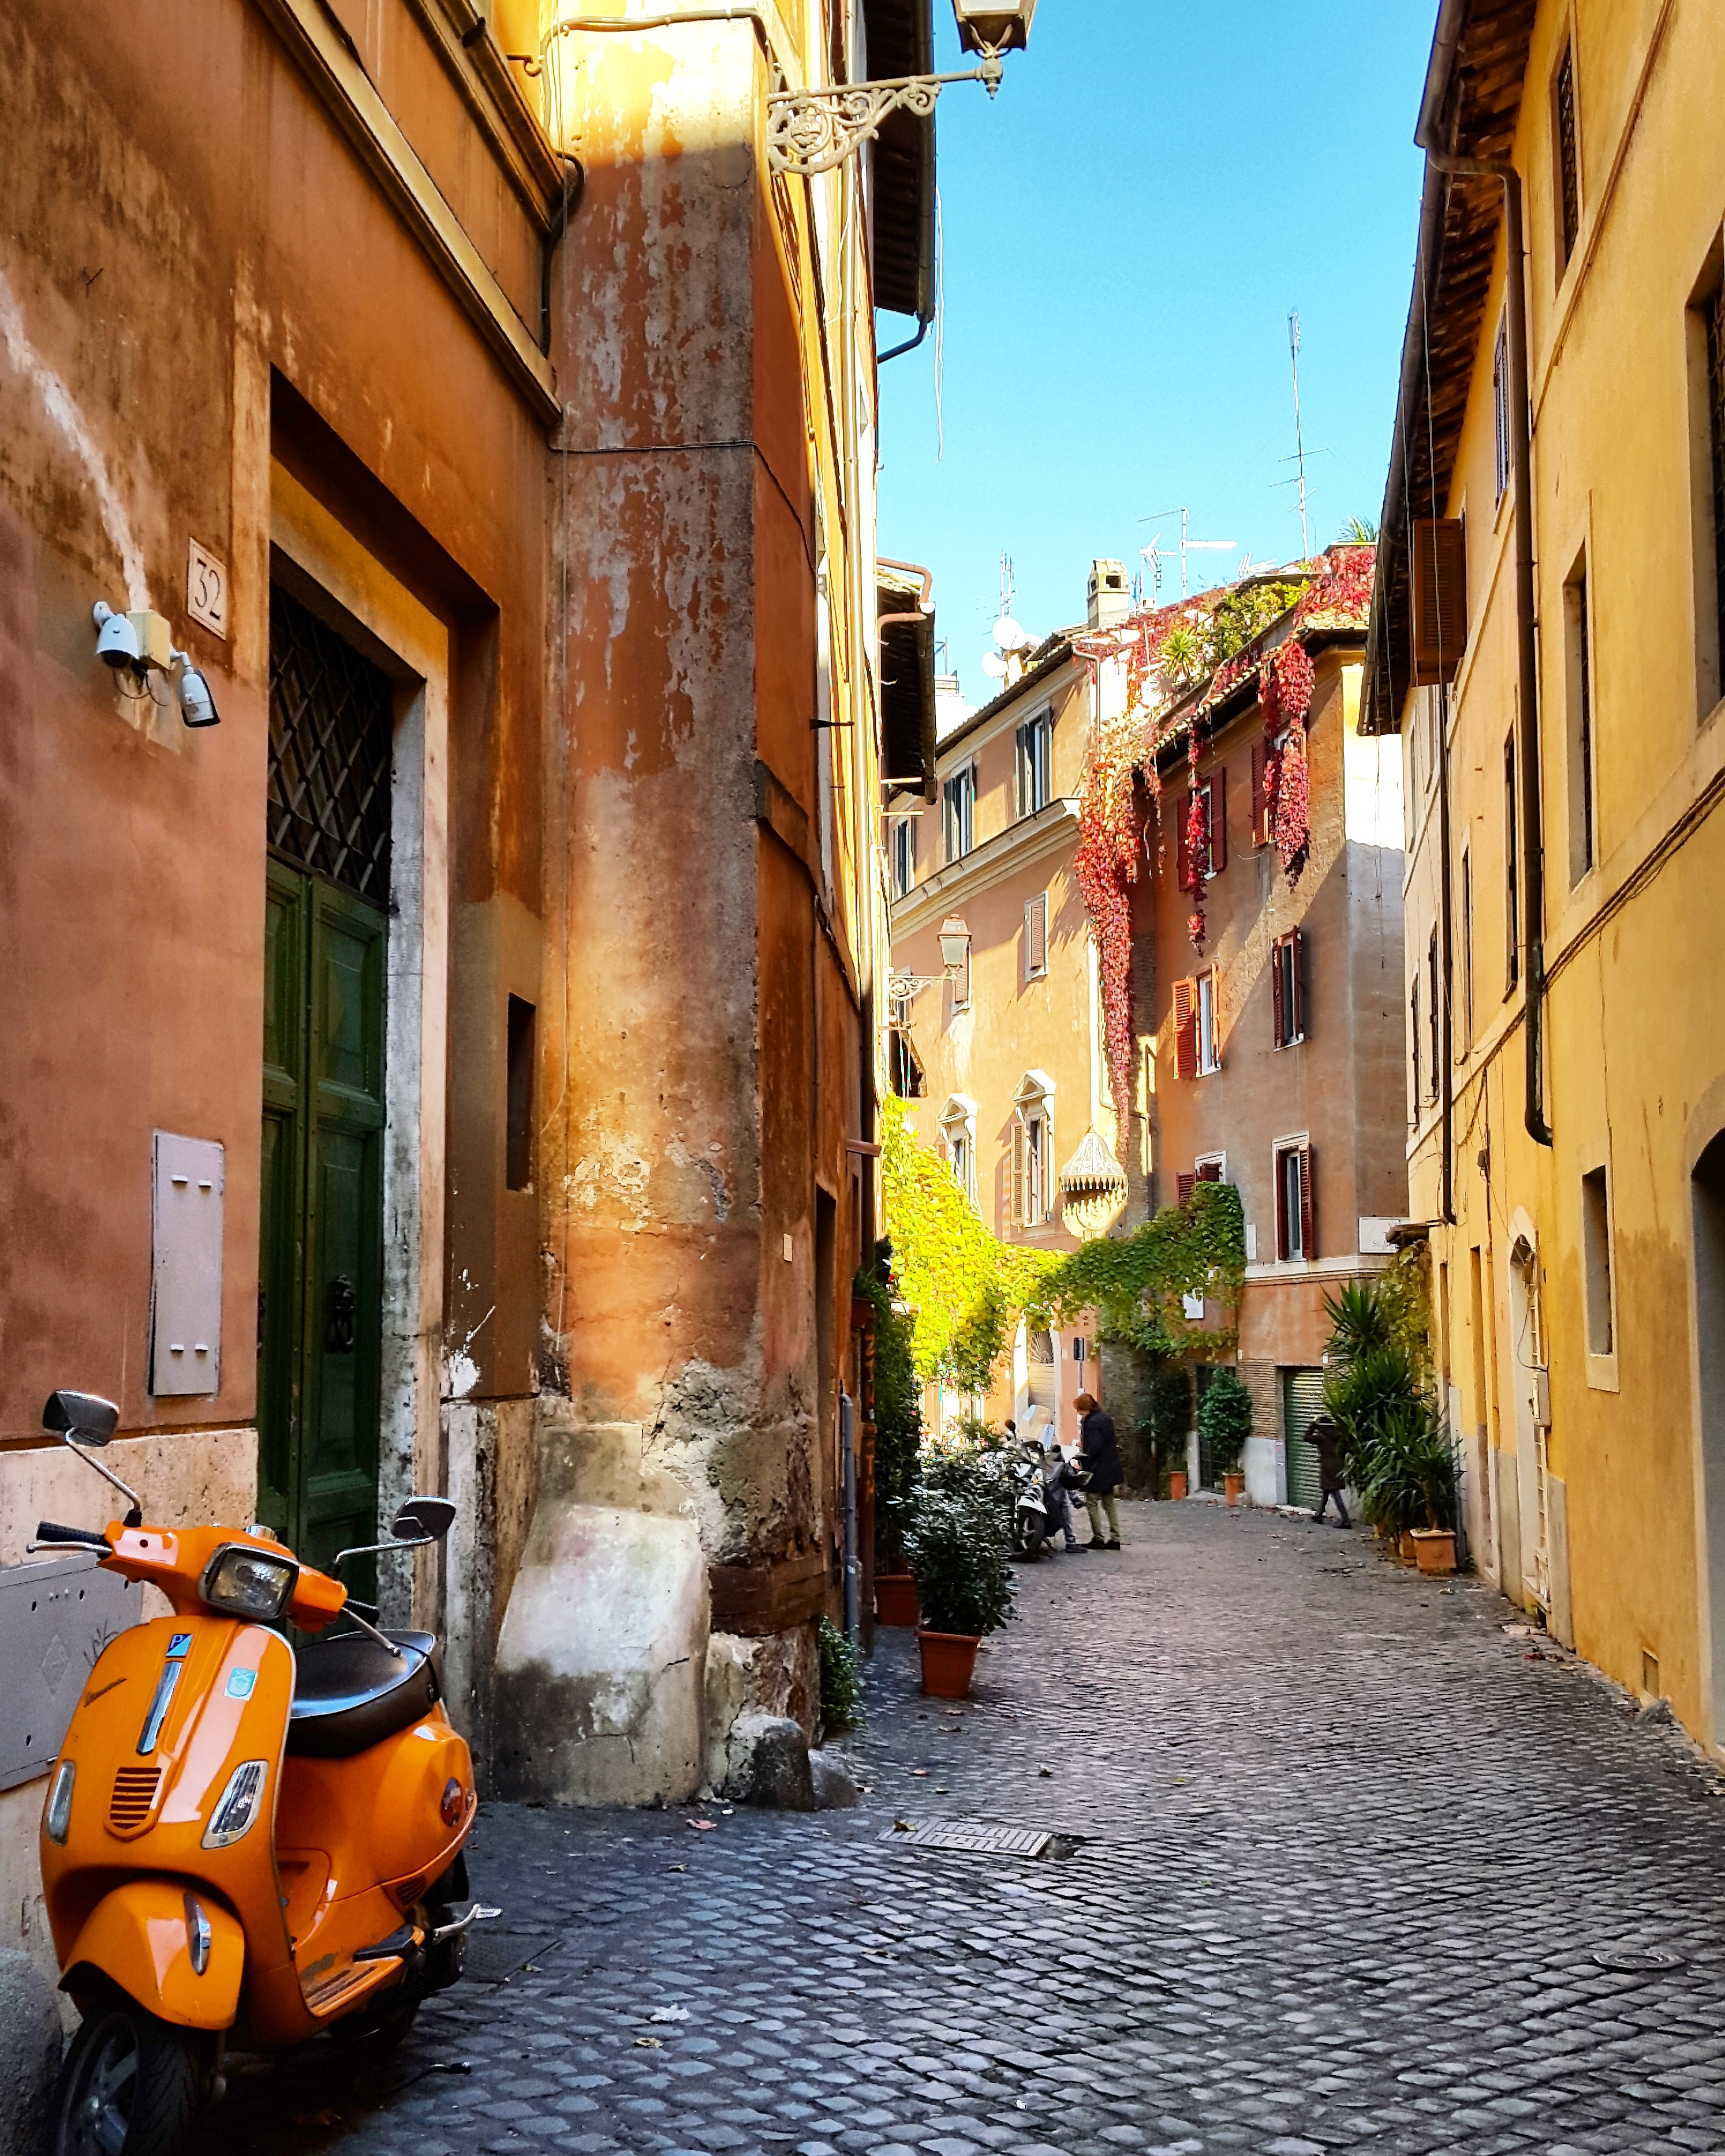 The ordinary beauty of Rome